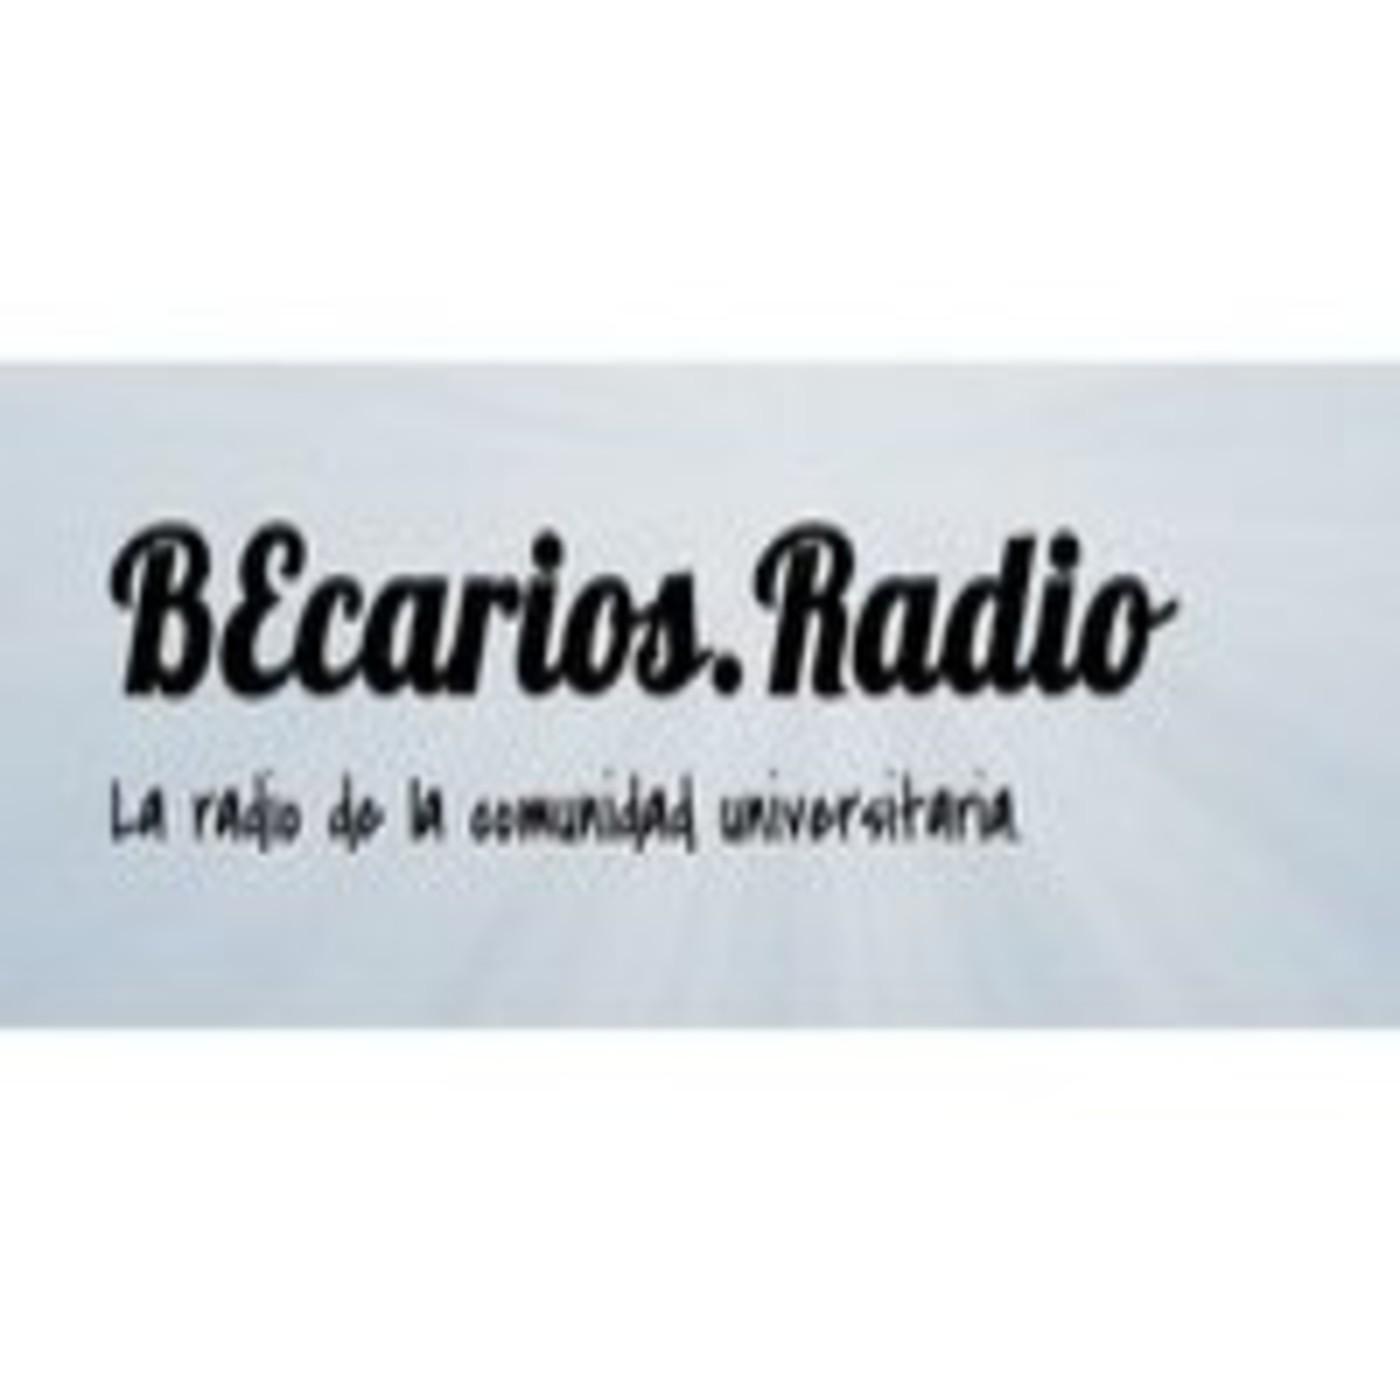 <![CDATA[Podcast Becarioradio]]>